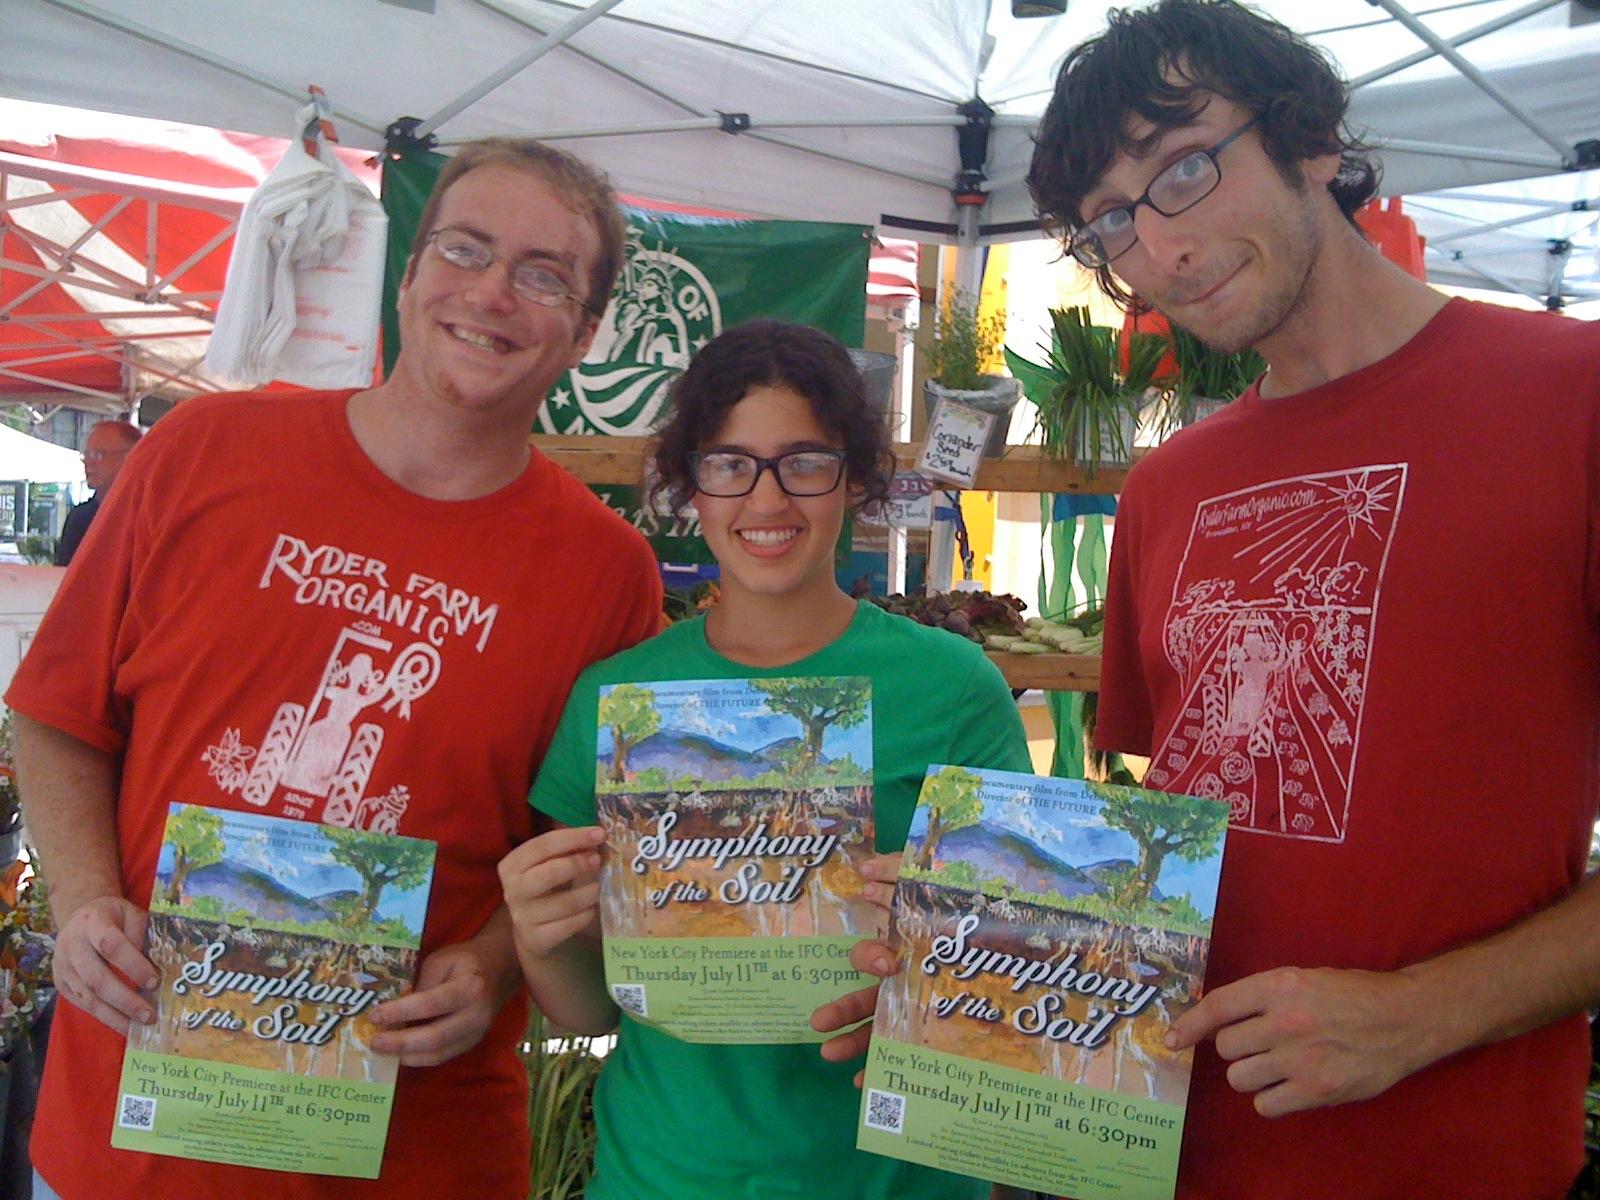 The good folk from Ryder Organic Farms